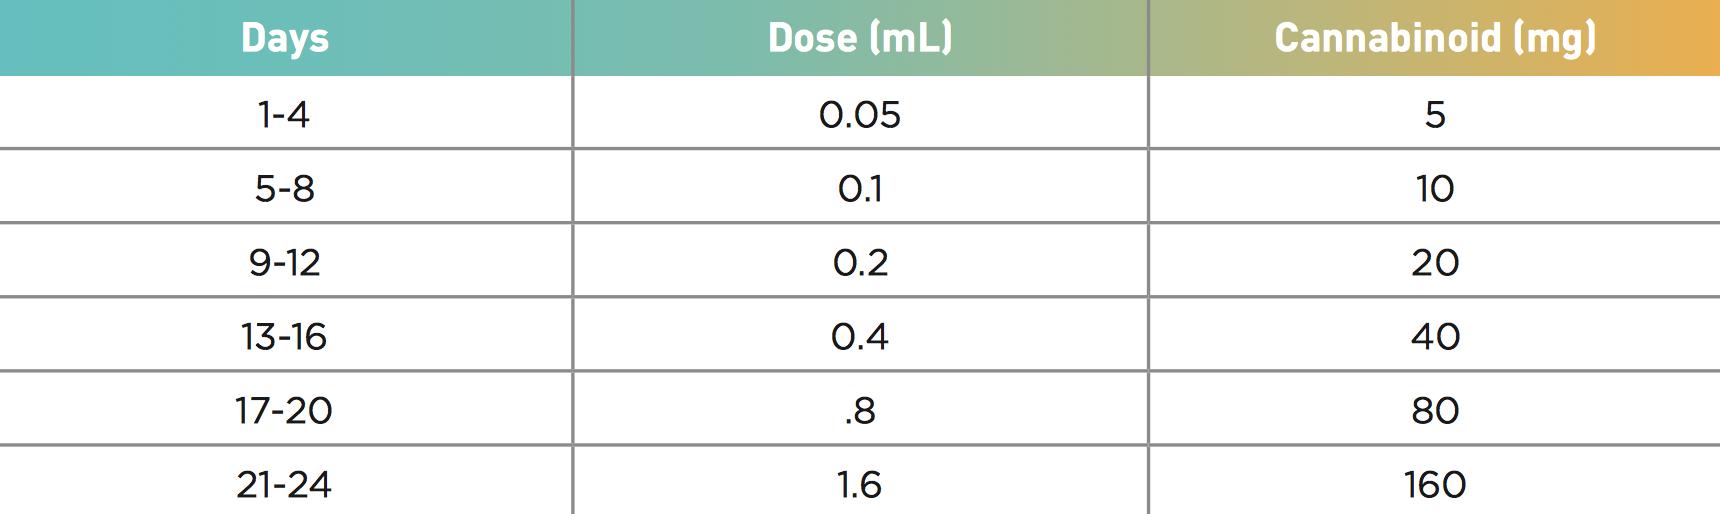 dosing-guide